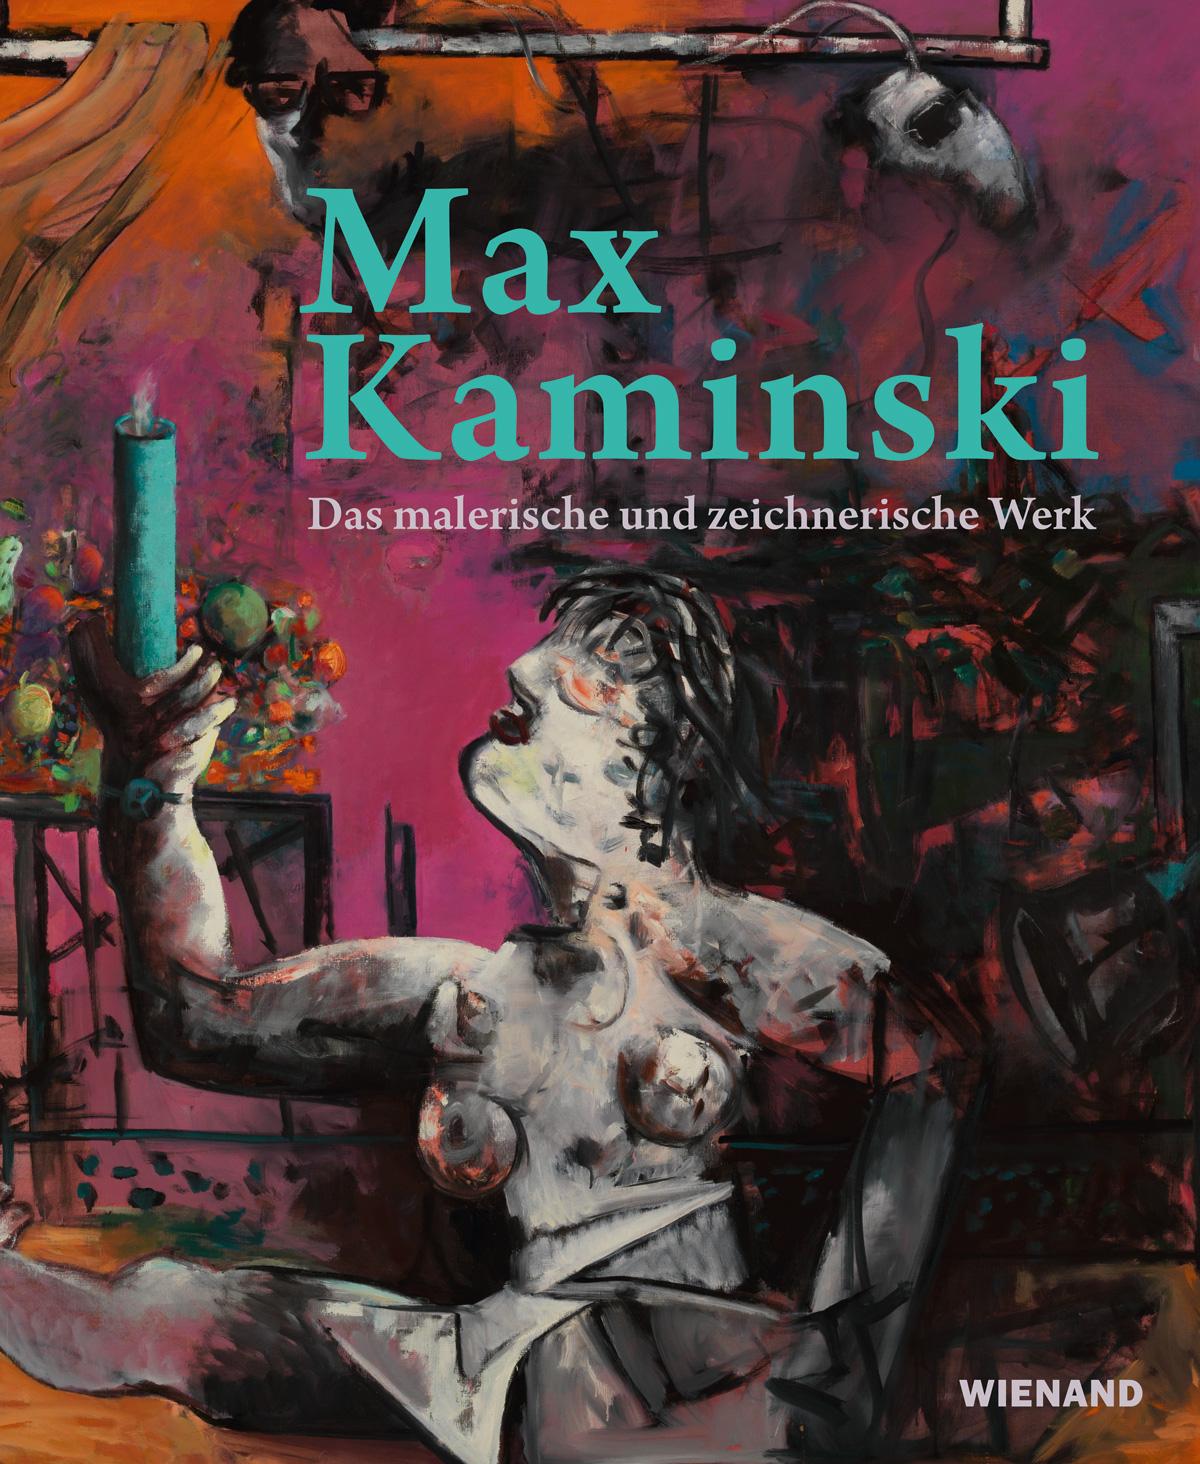 Max Kaminski